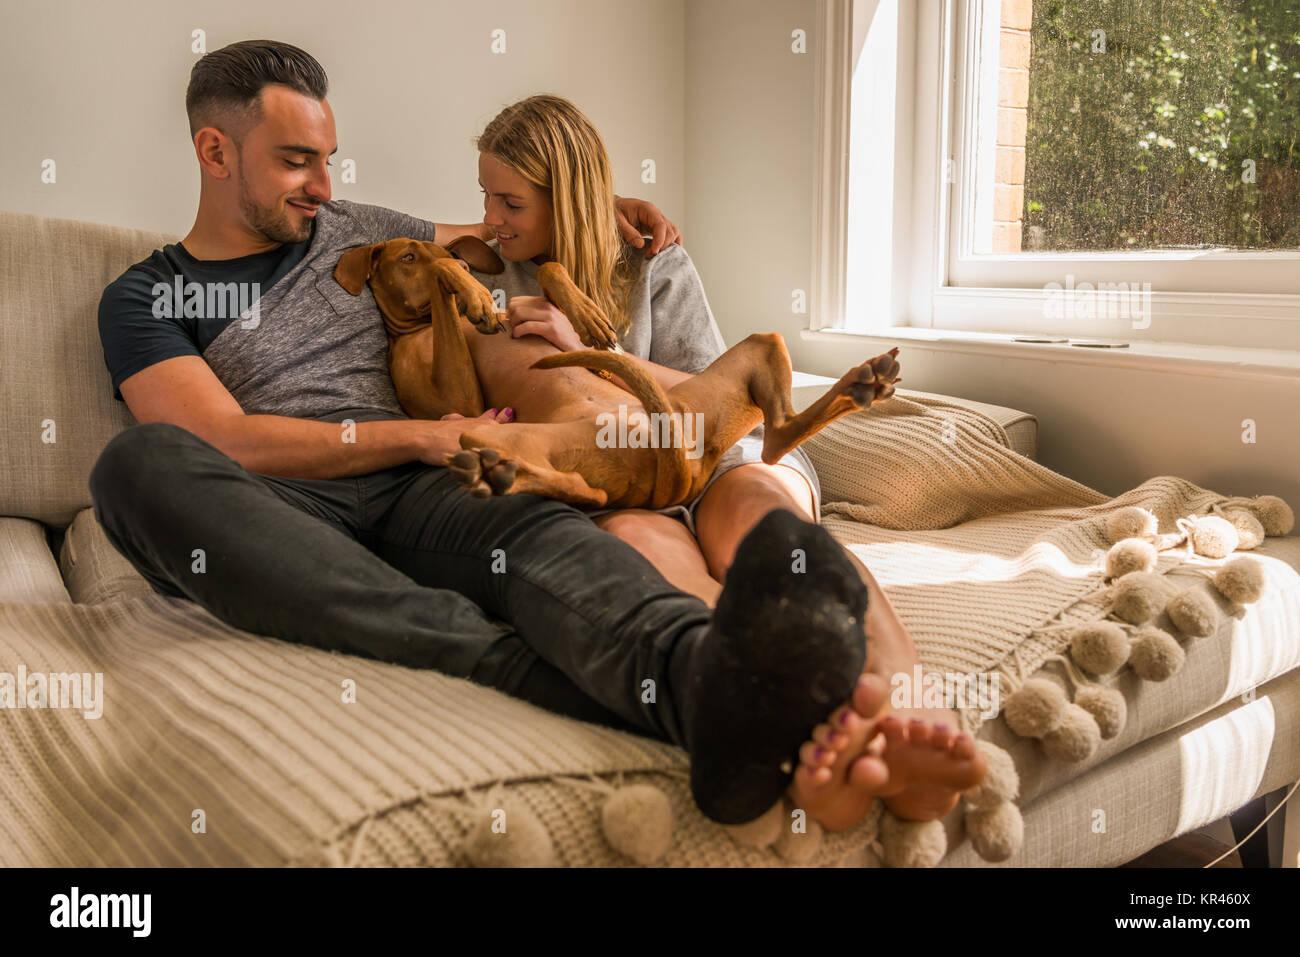 Couple on sofa by window cuddling dog - Stock Image